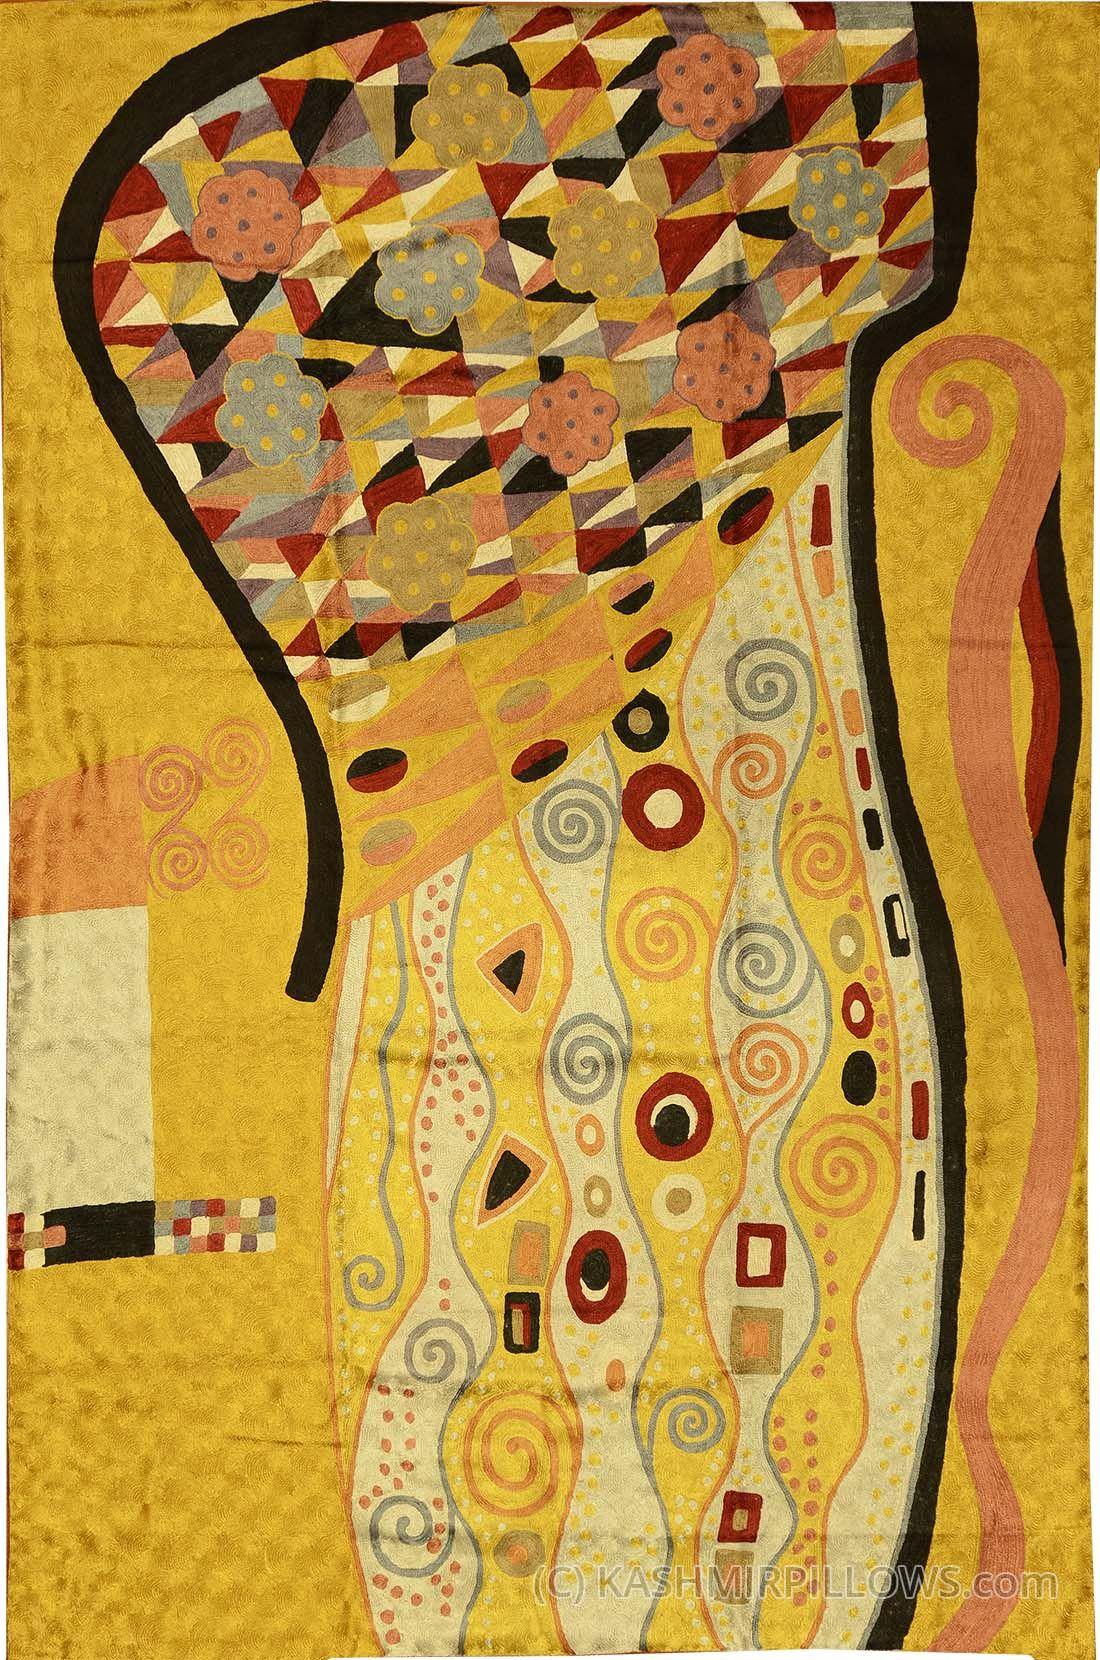 Klimt x art nouveau gold silk abstract rug tapestry hand embroidered kashmir fine arts craftskashmir fine arts crafts